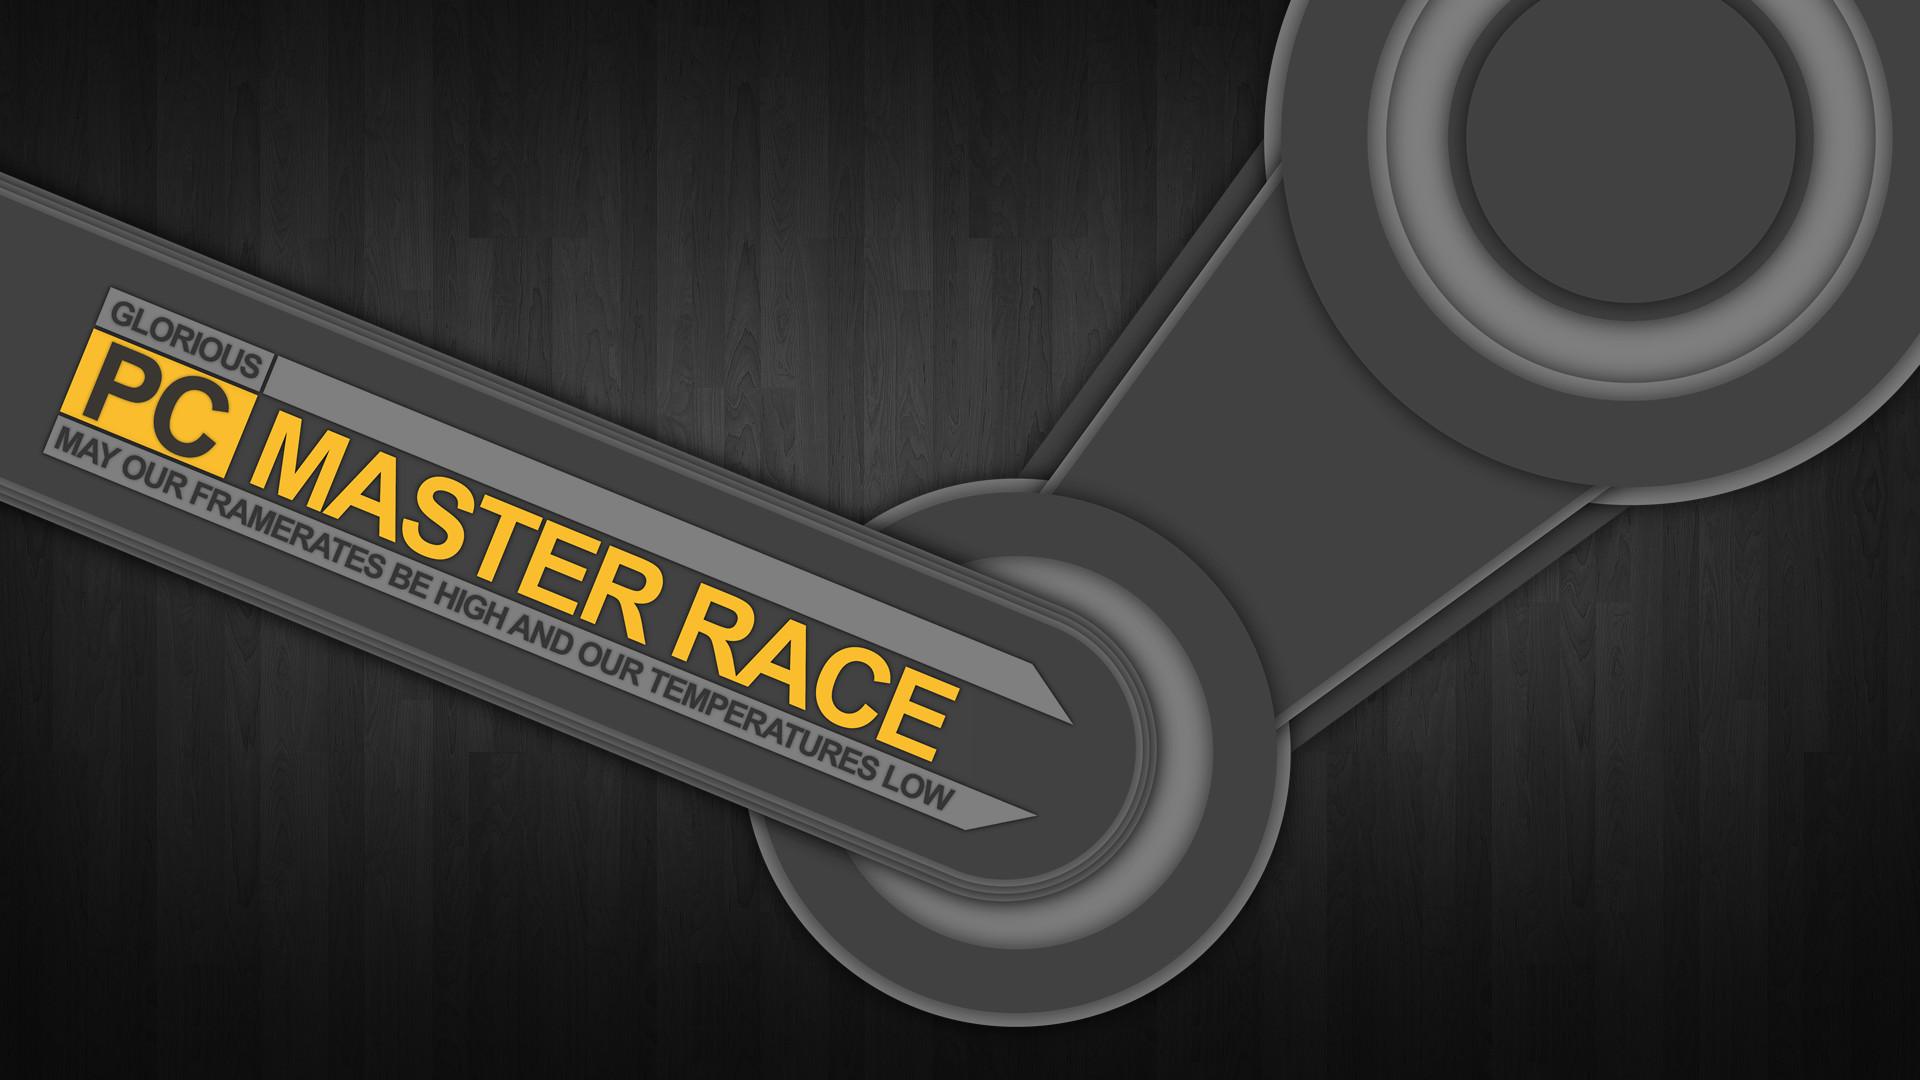 [OC] Steam Logo + PCMR Logo + Google's Material Design = Glorious New  Wallpaper [8000×4500] : pcmasterrace